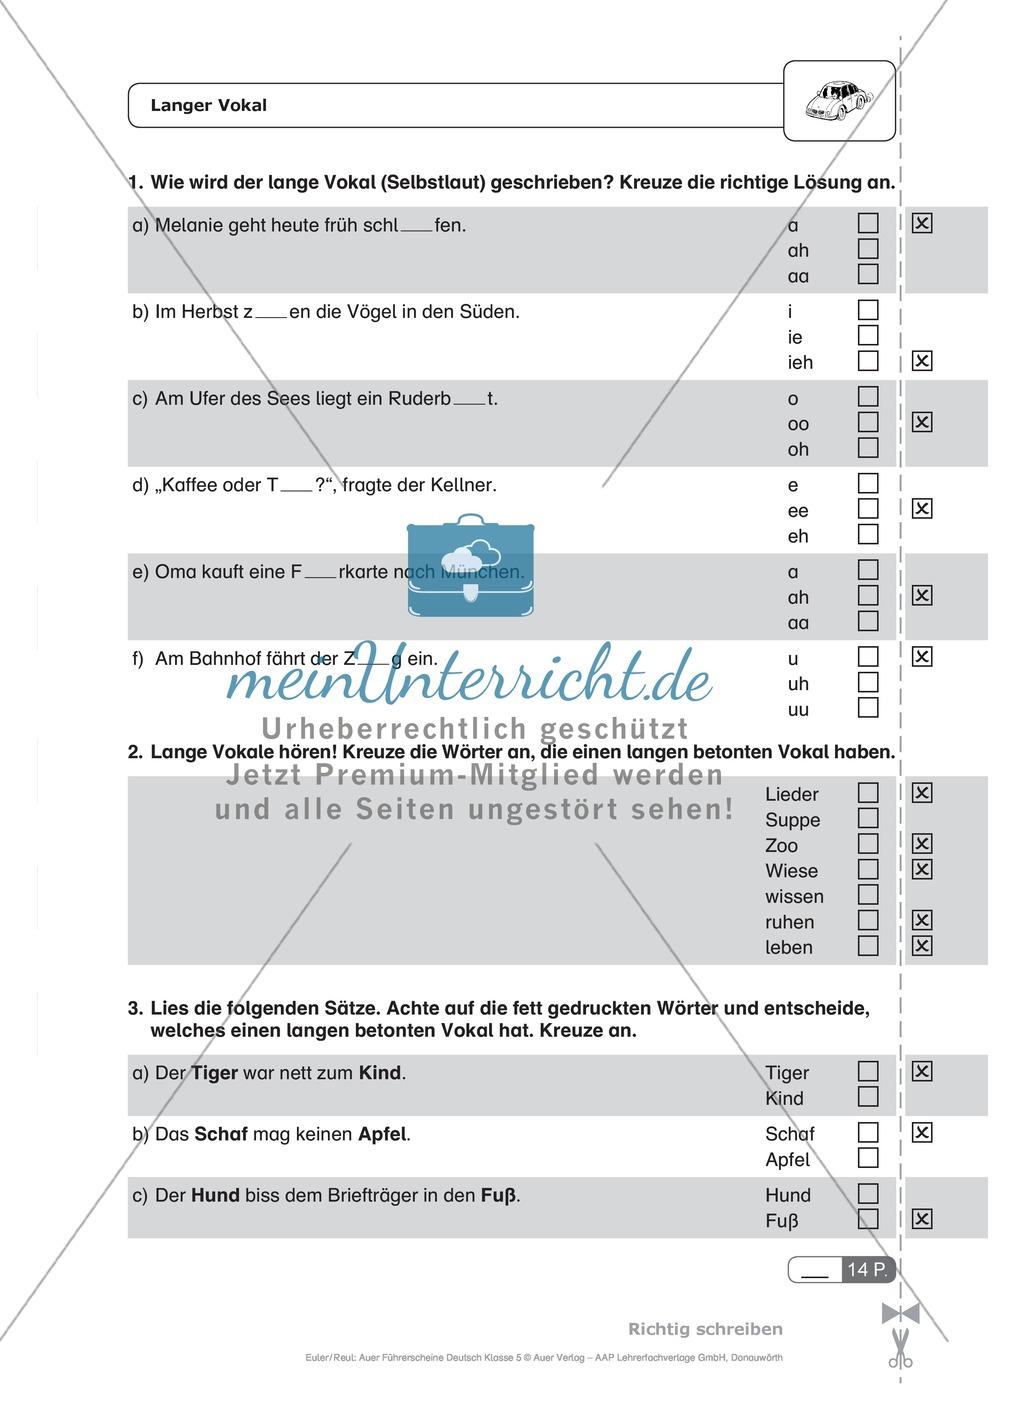 Fein Kurze Vokale Arbeitsblatt Zeitgenössisch - Mathe Arbeitsblatt ...